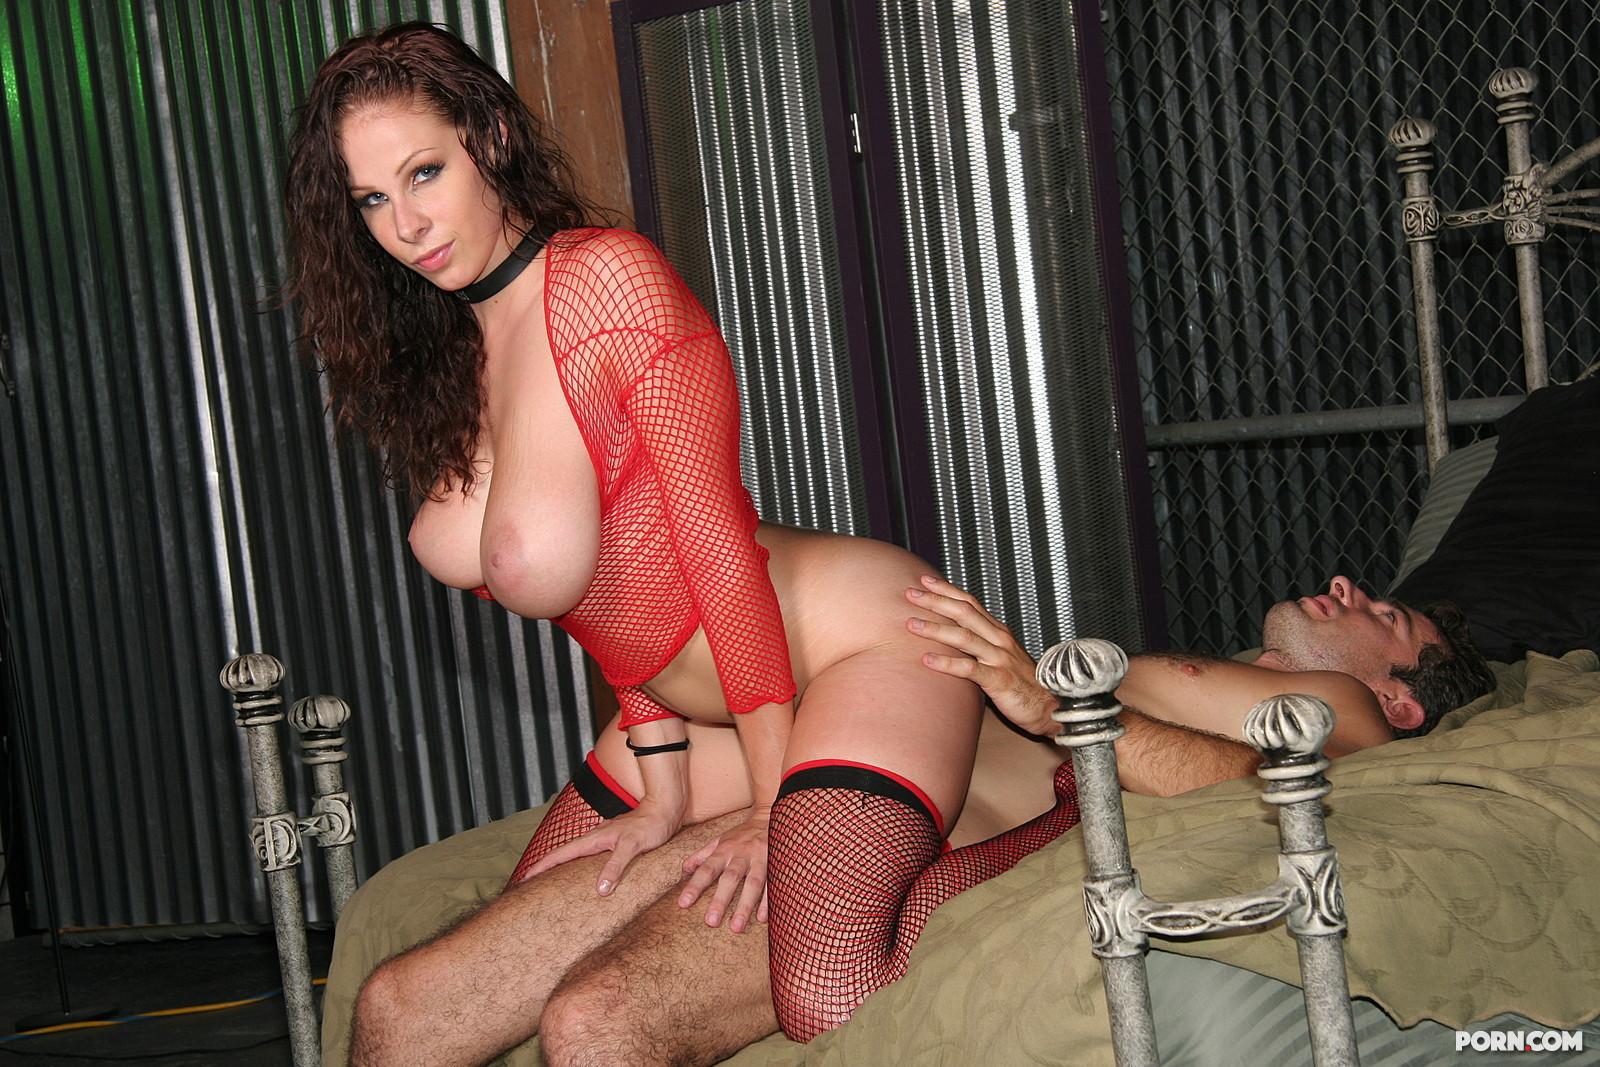 Рабыни ублажают хозяина порно онлайн 20 фотография